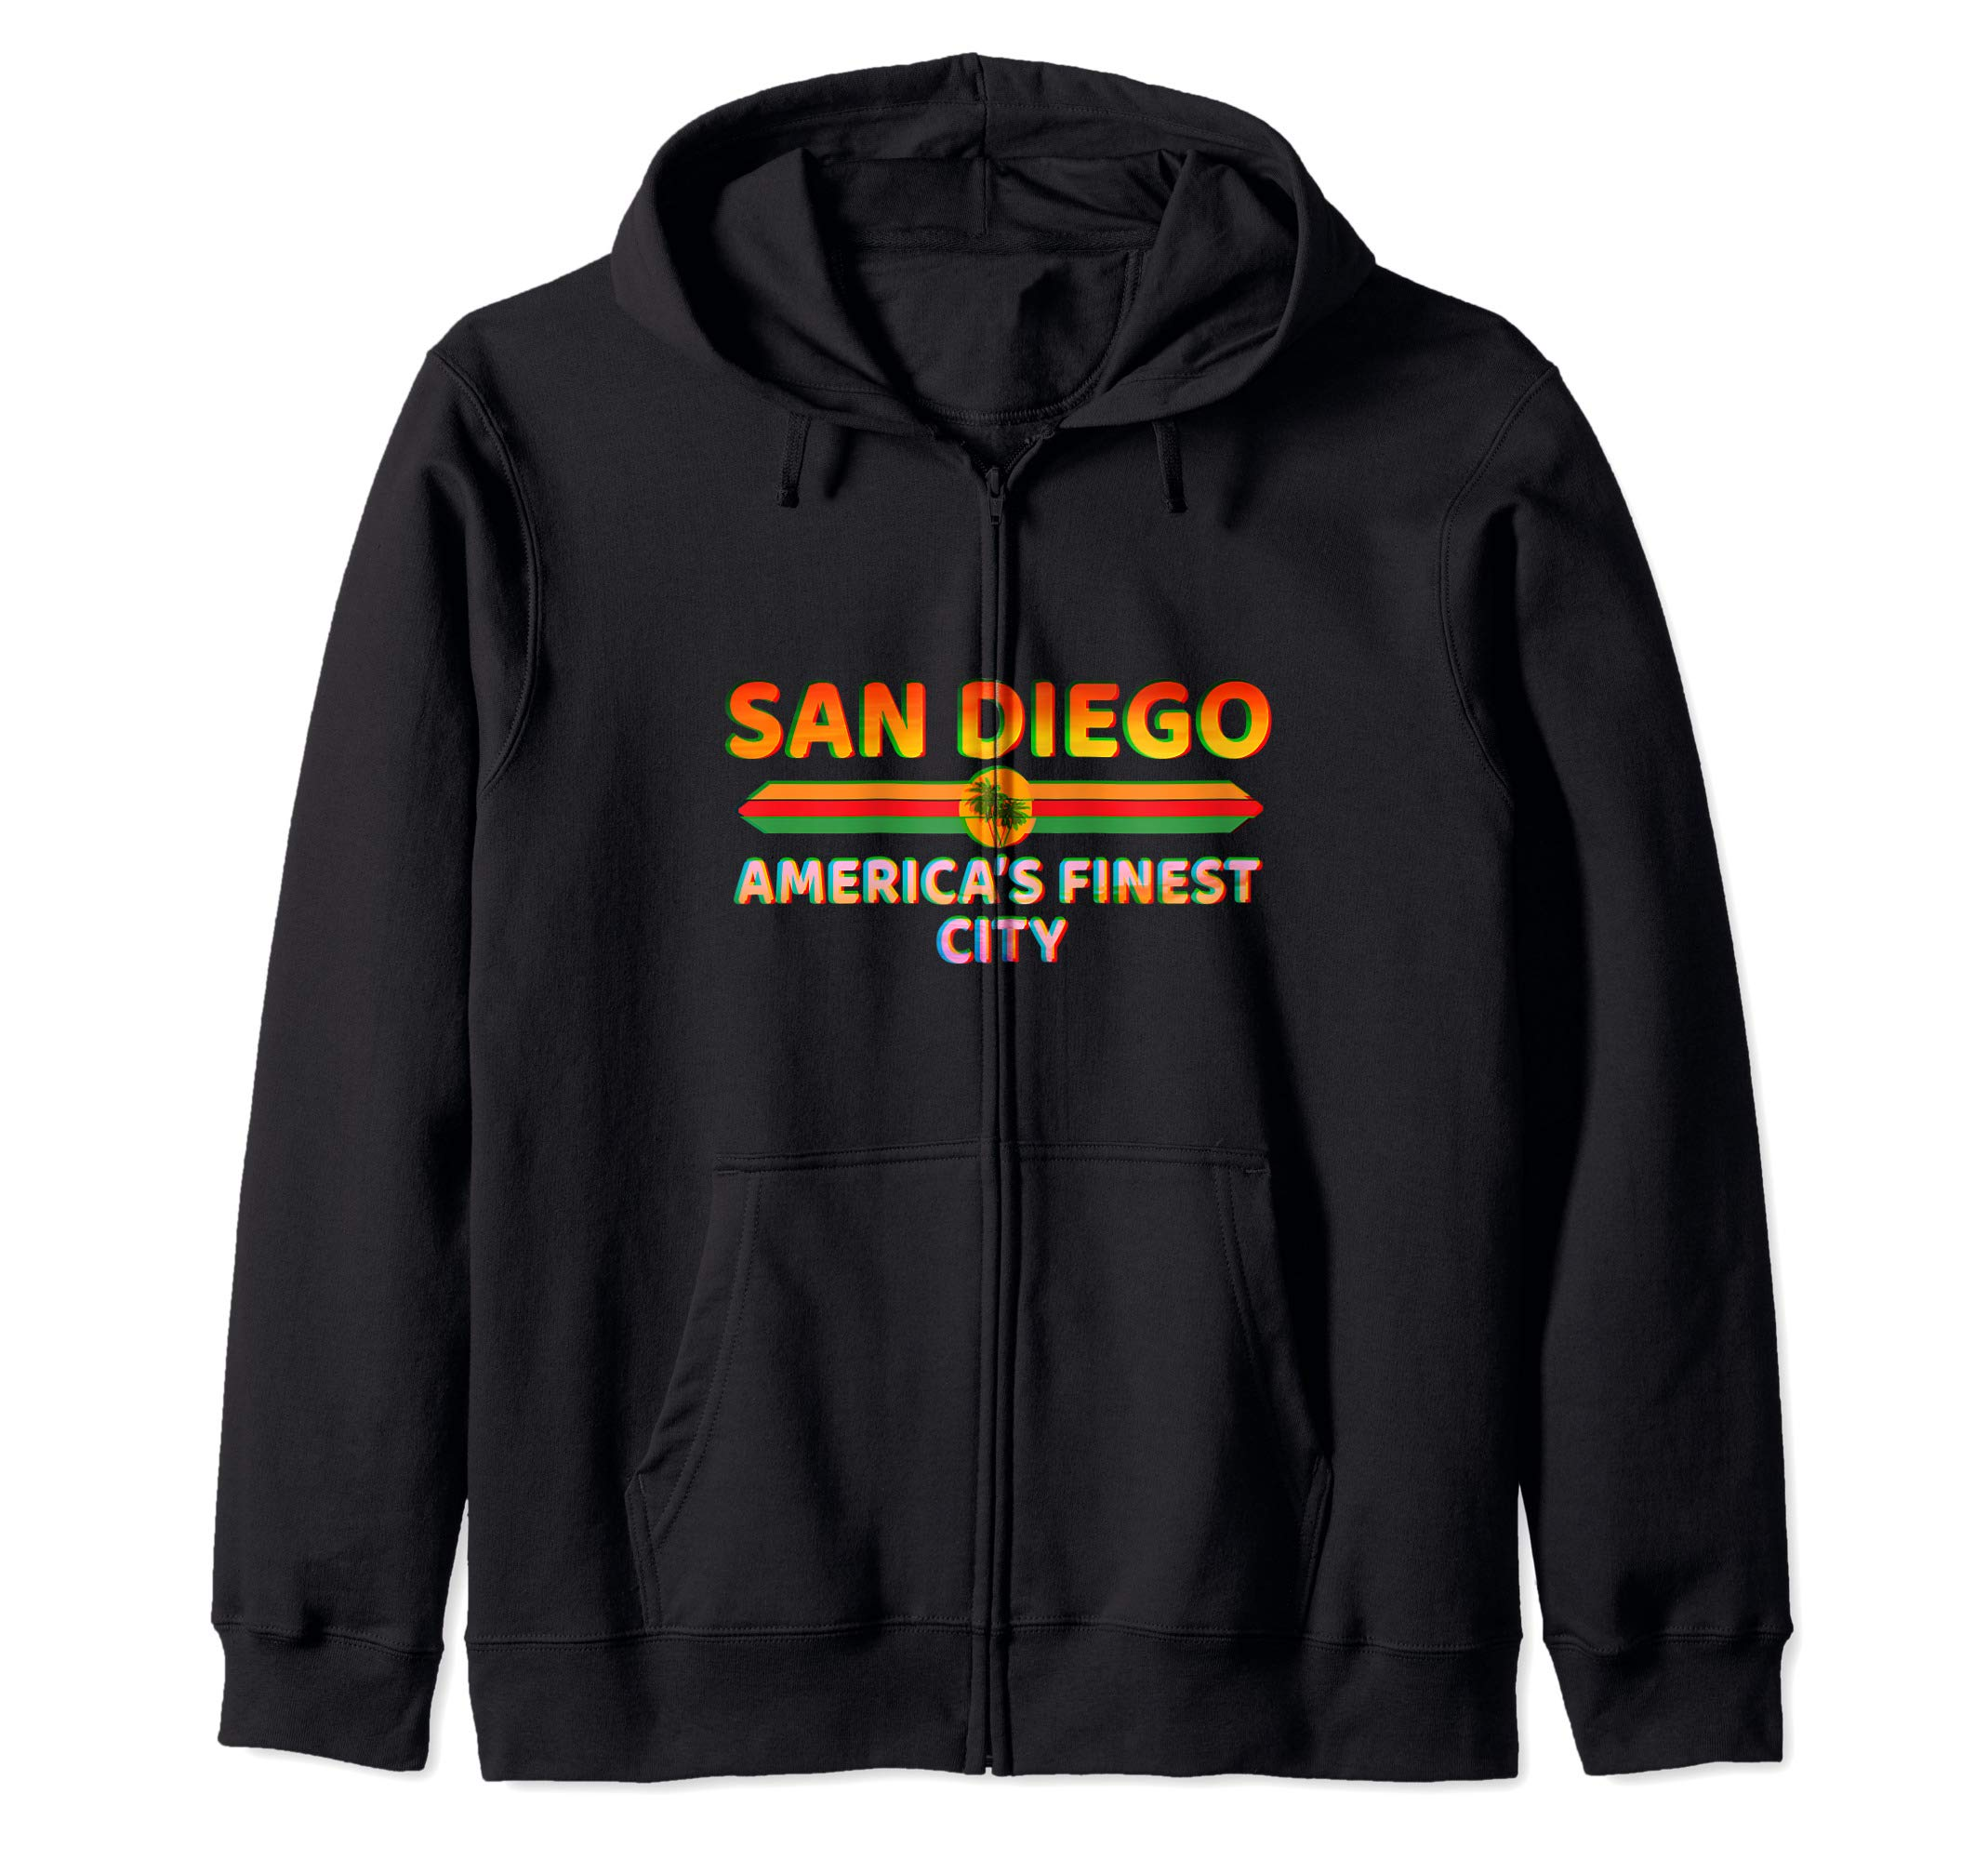 San Diego America's Finest City - California Retro San Diego Zip Hoodie by La Ferte-Bernard